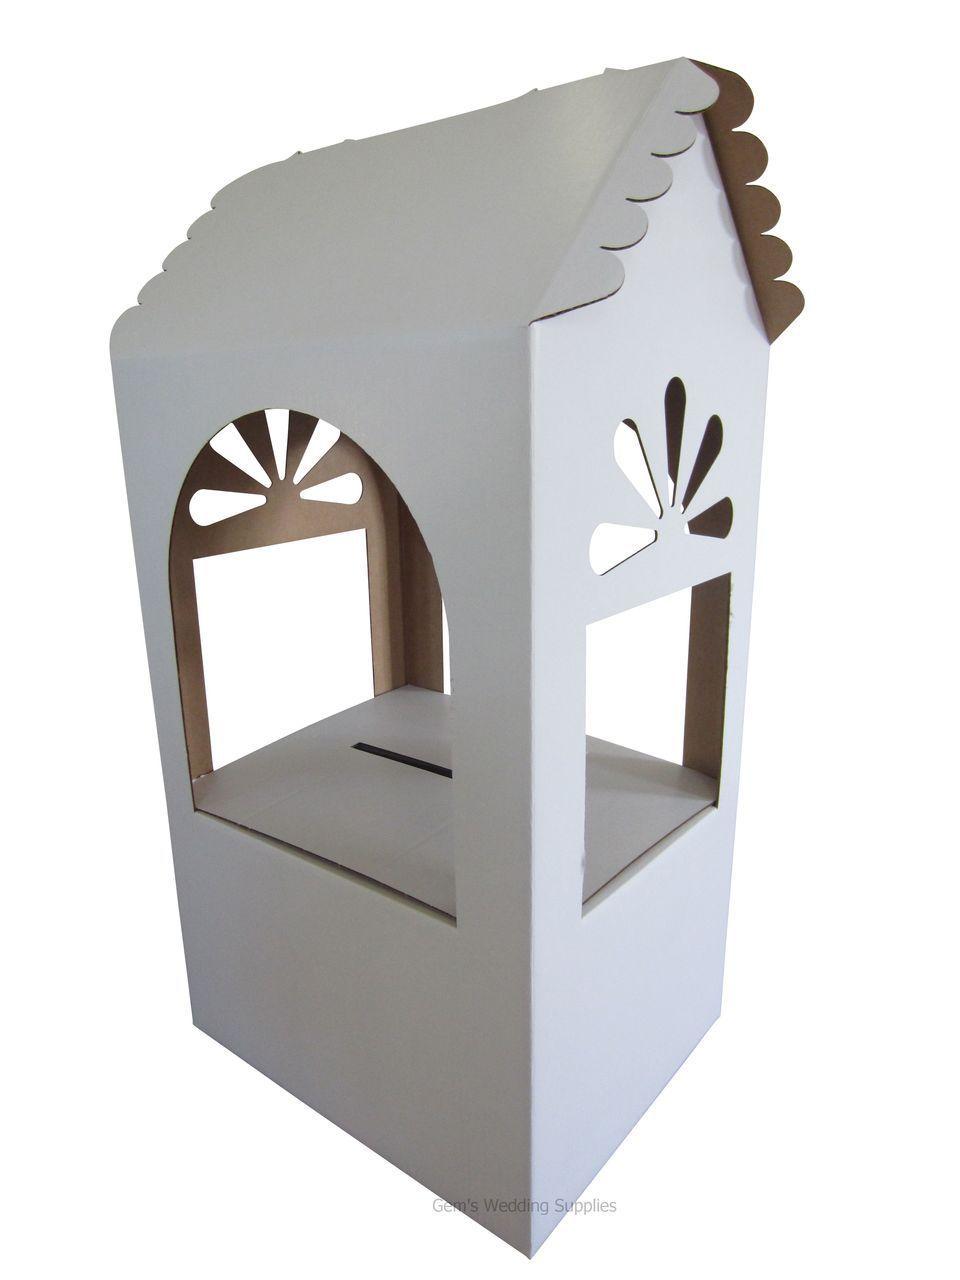 Gems Wedding Supplies - White Cardboard Wishing Well, $59.95 (http ...